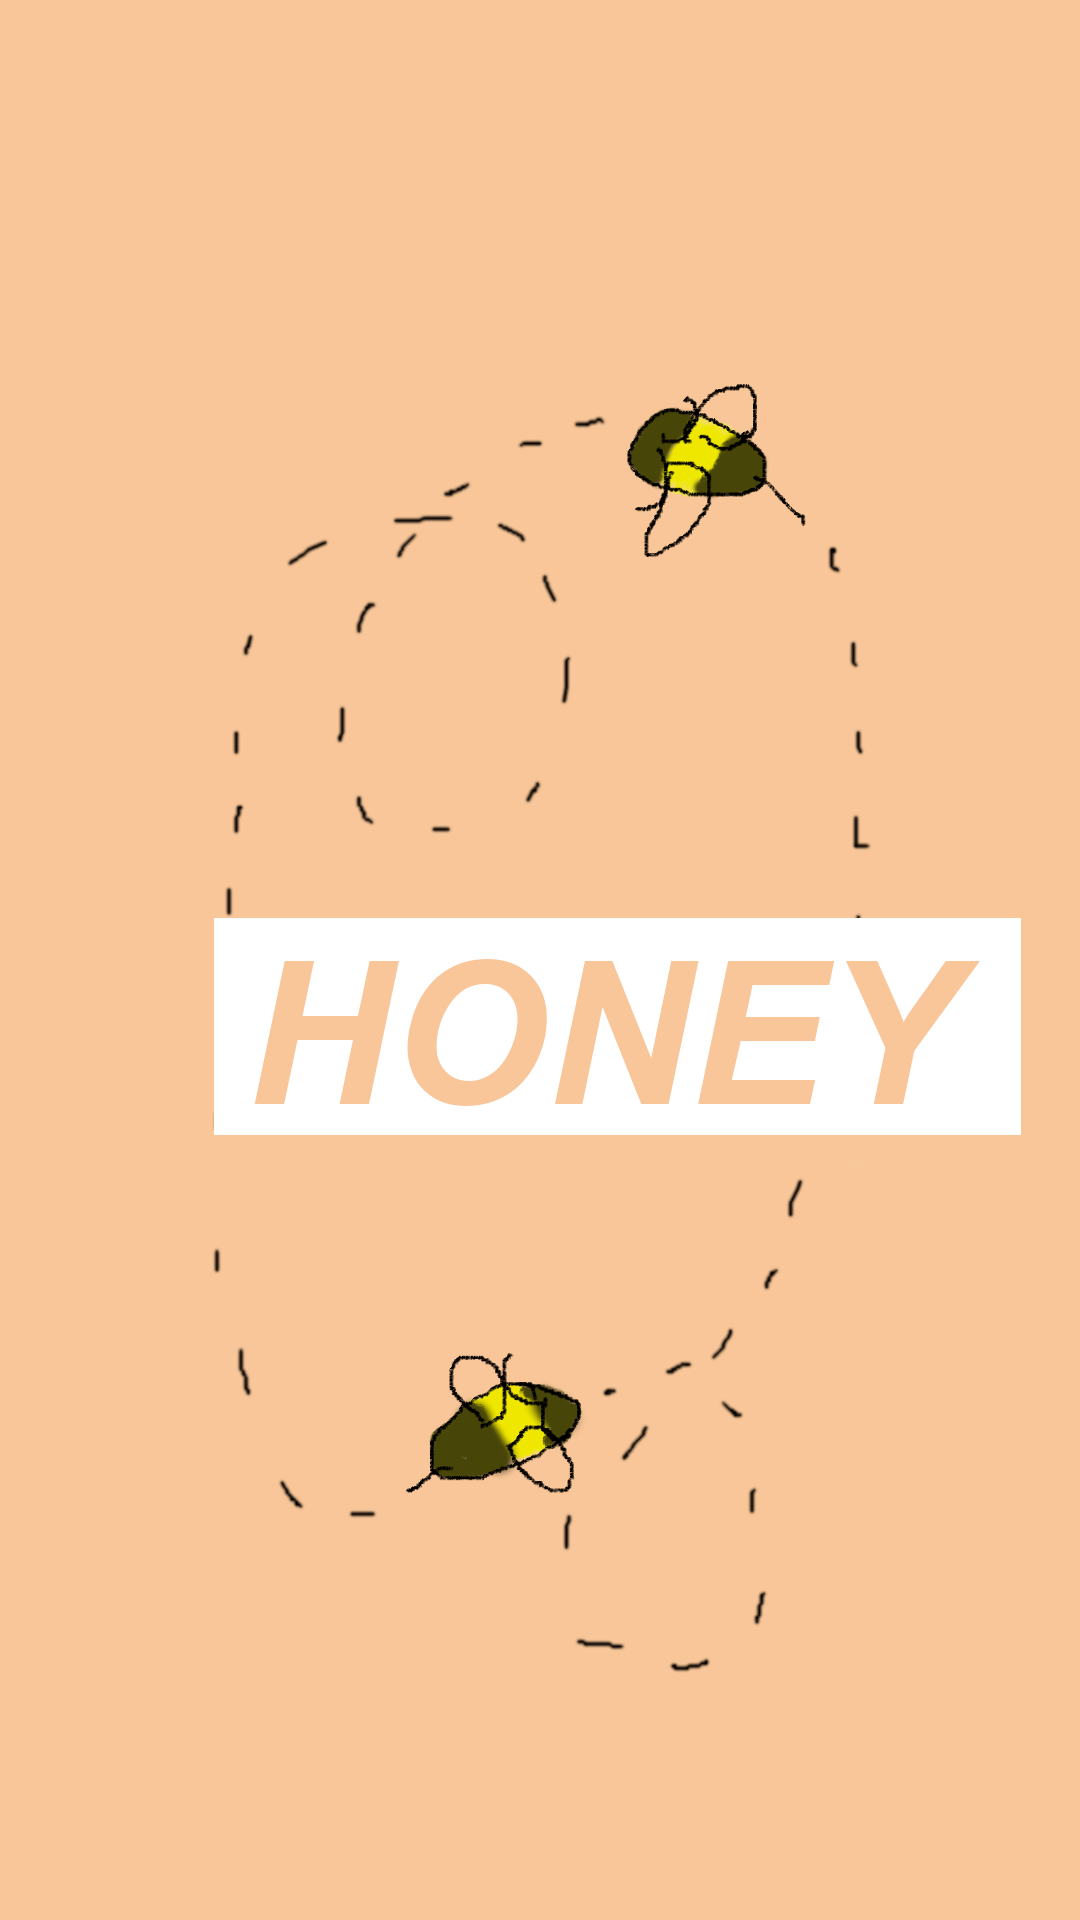 aesthetic bee wallpapers